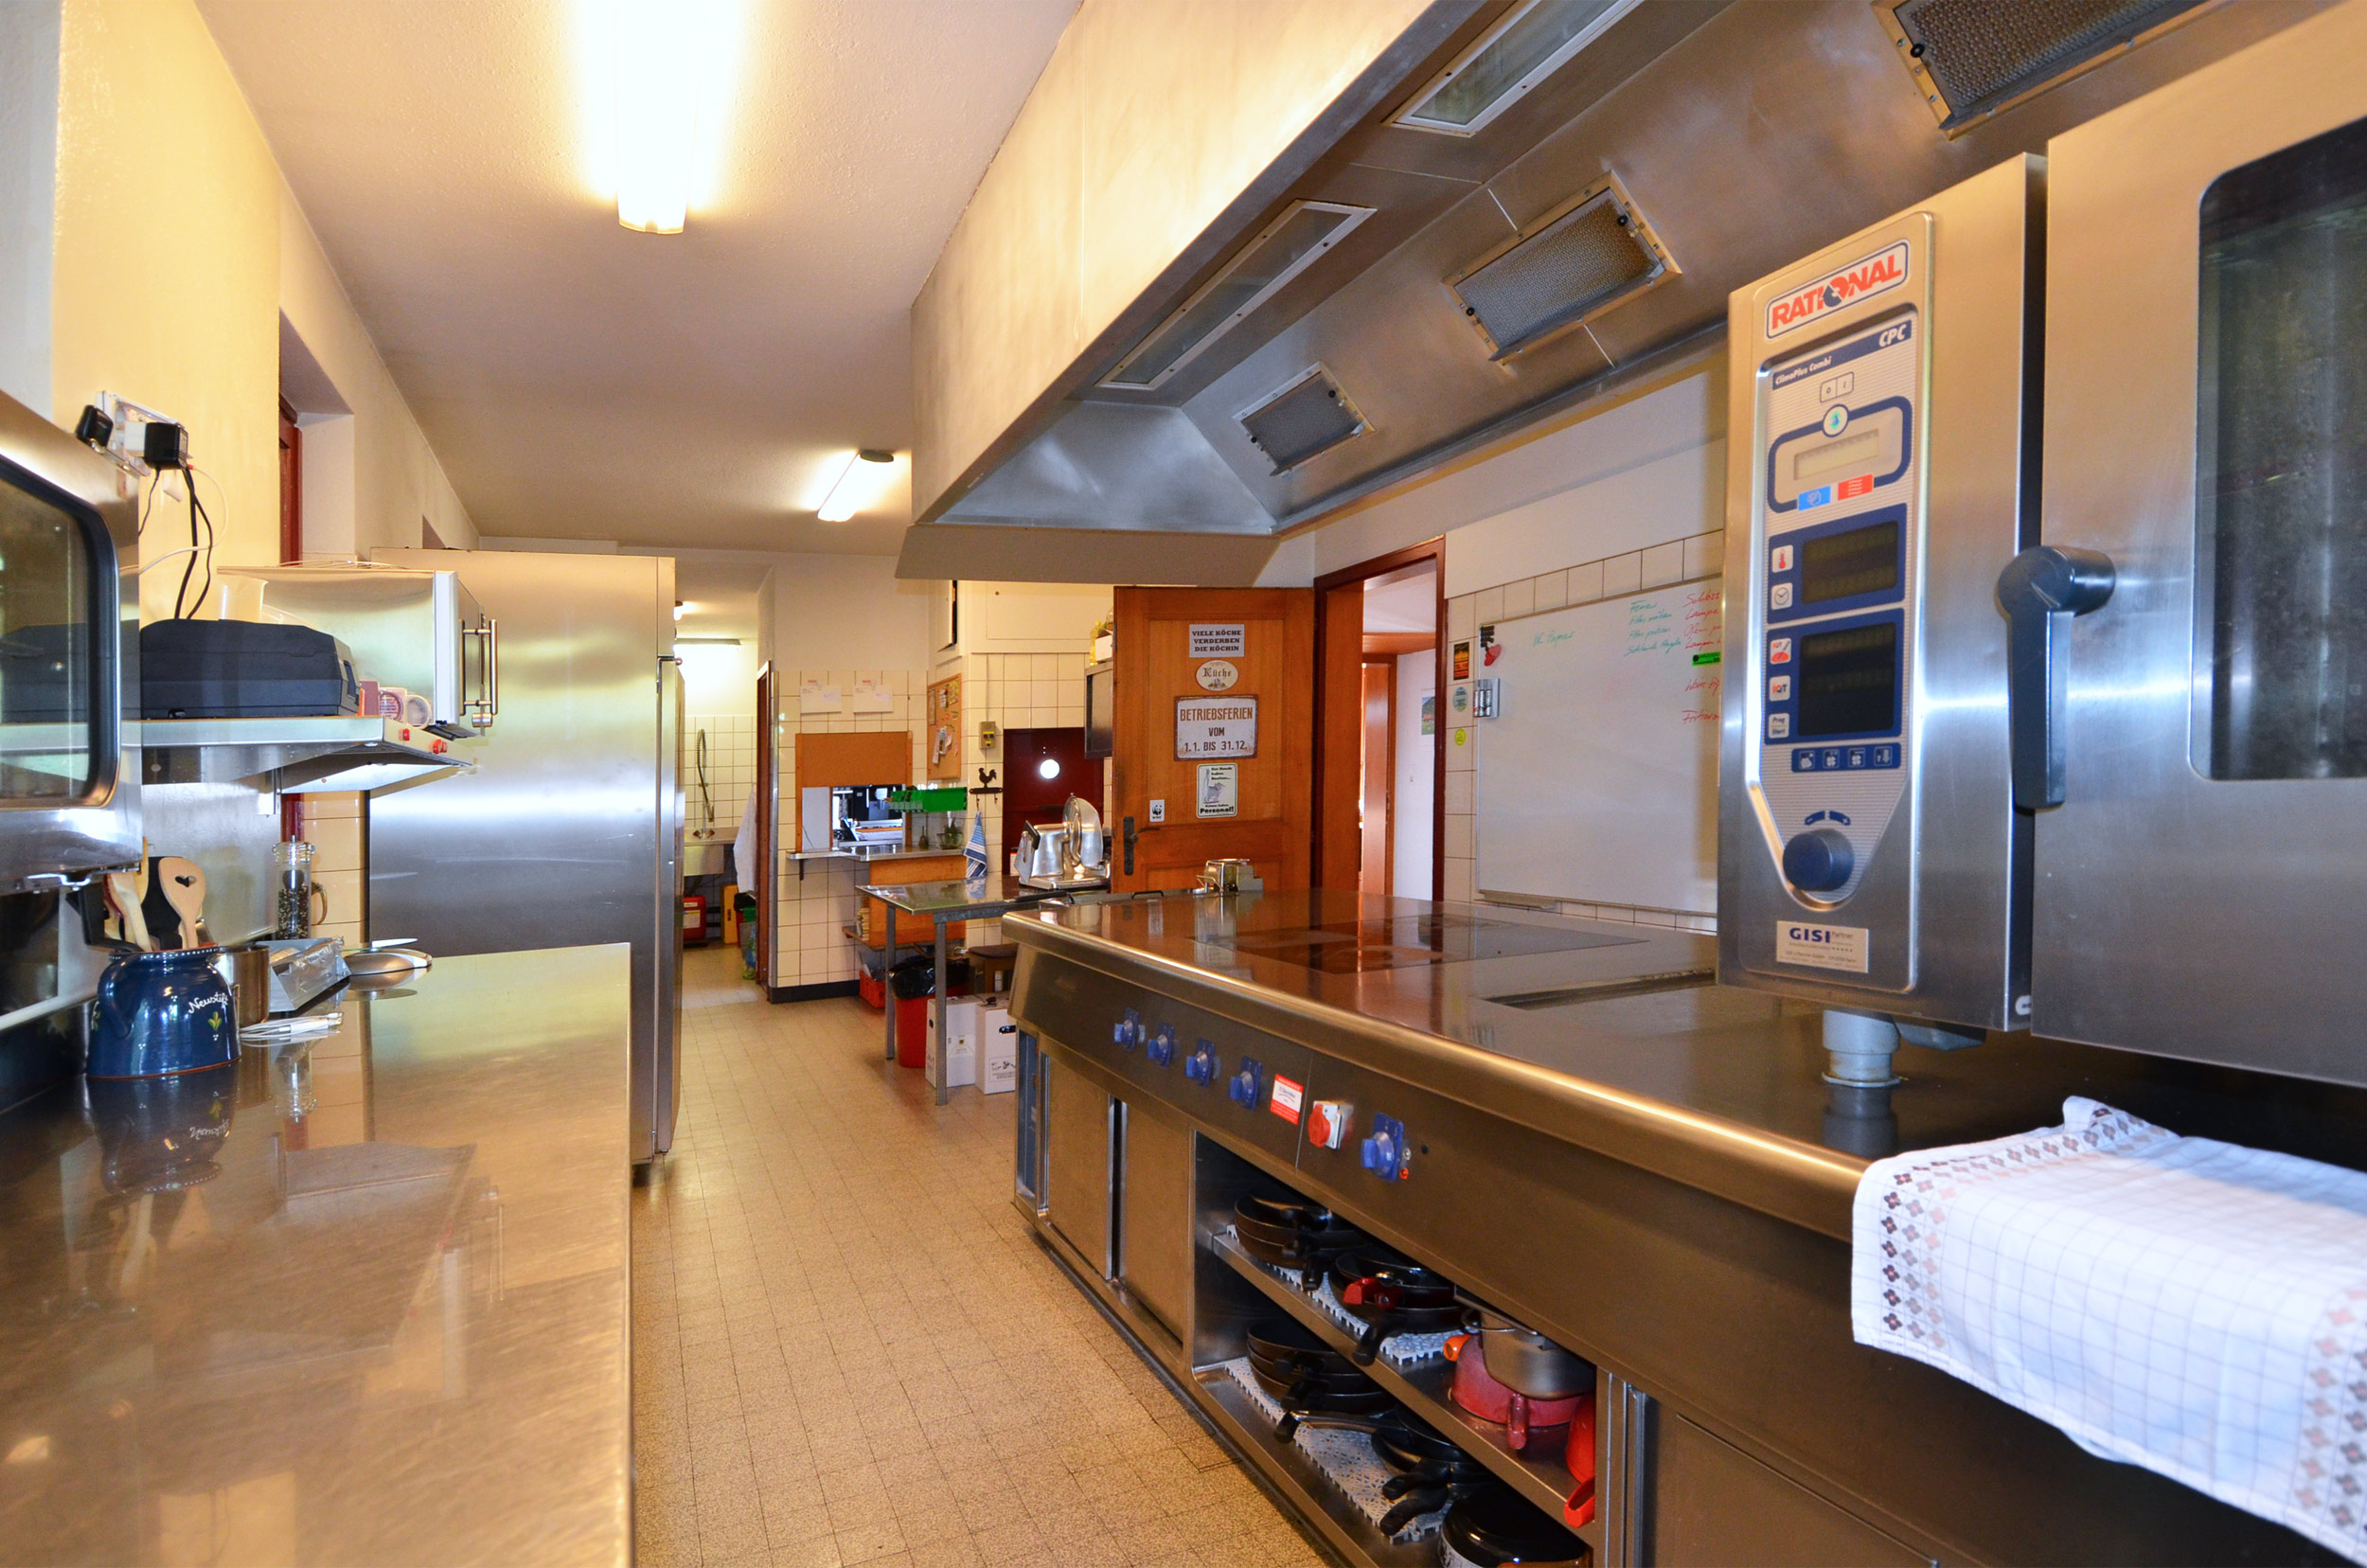 freistehendes 9-zi'- familienhaus / bergrestaurant, 4223 blauen